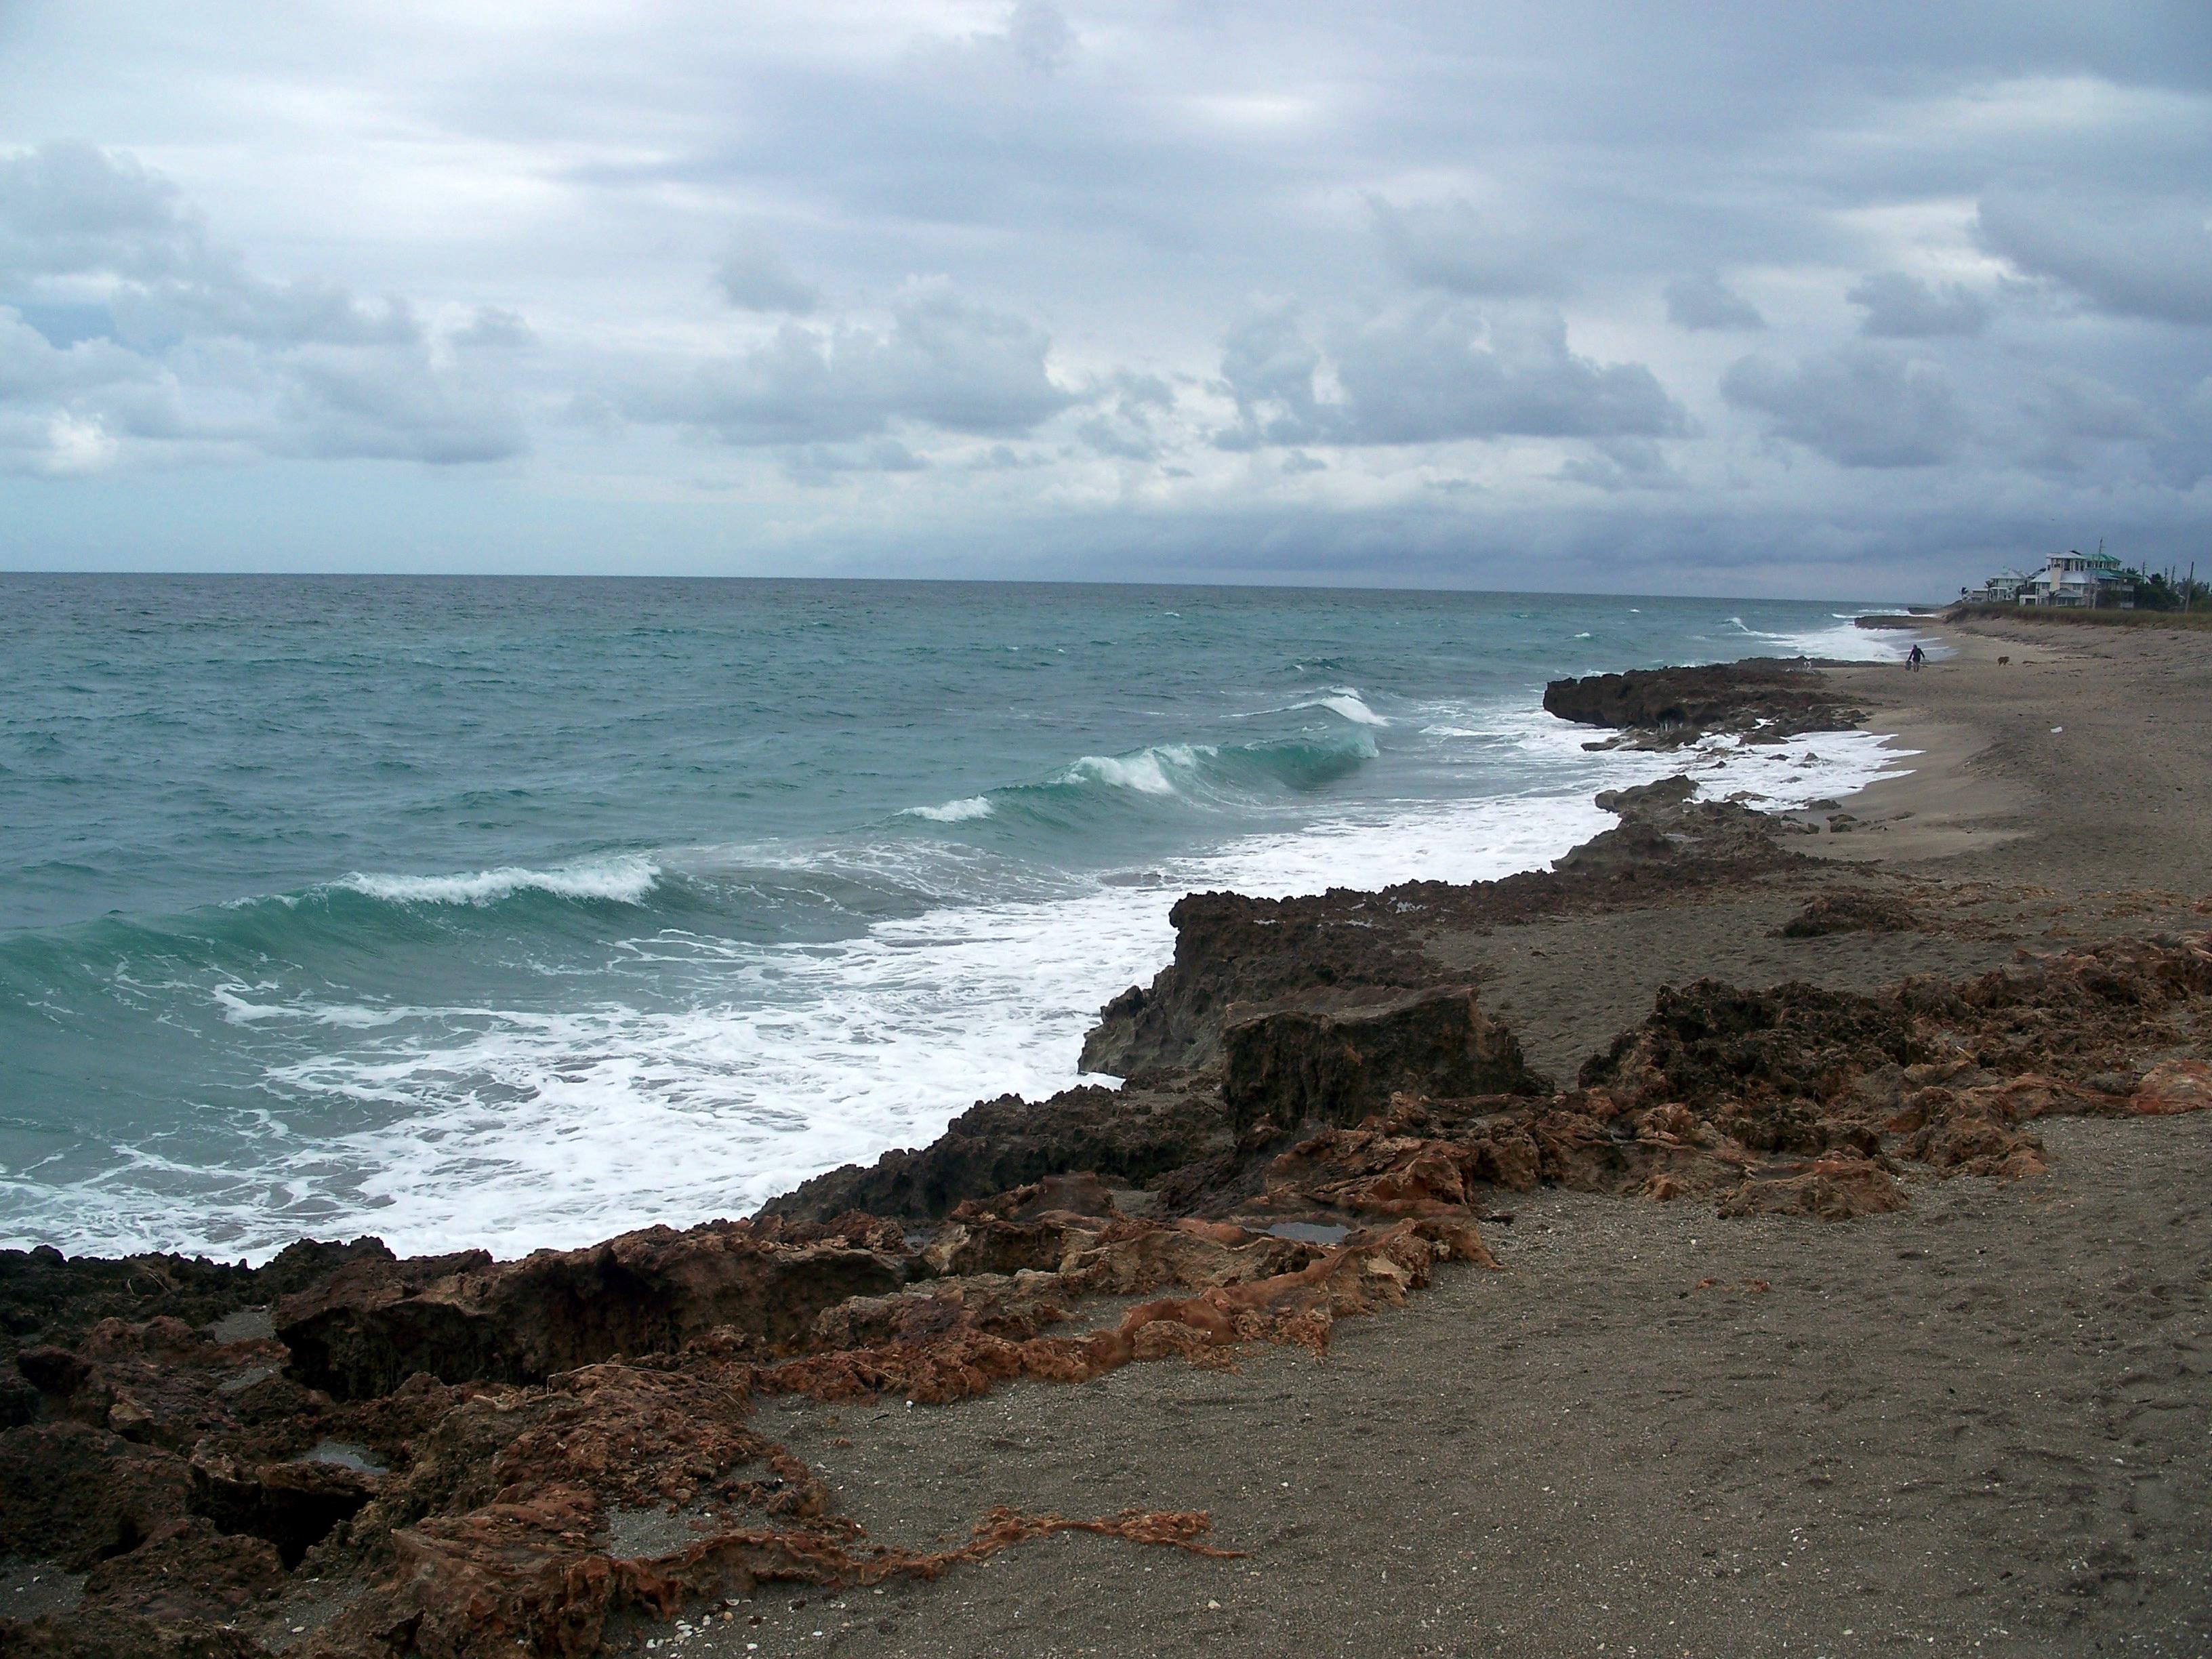 Hutchinson Island Beach Conditions